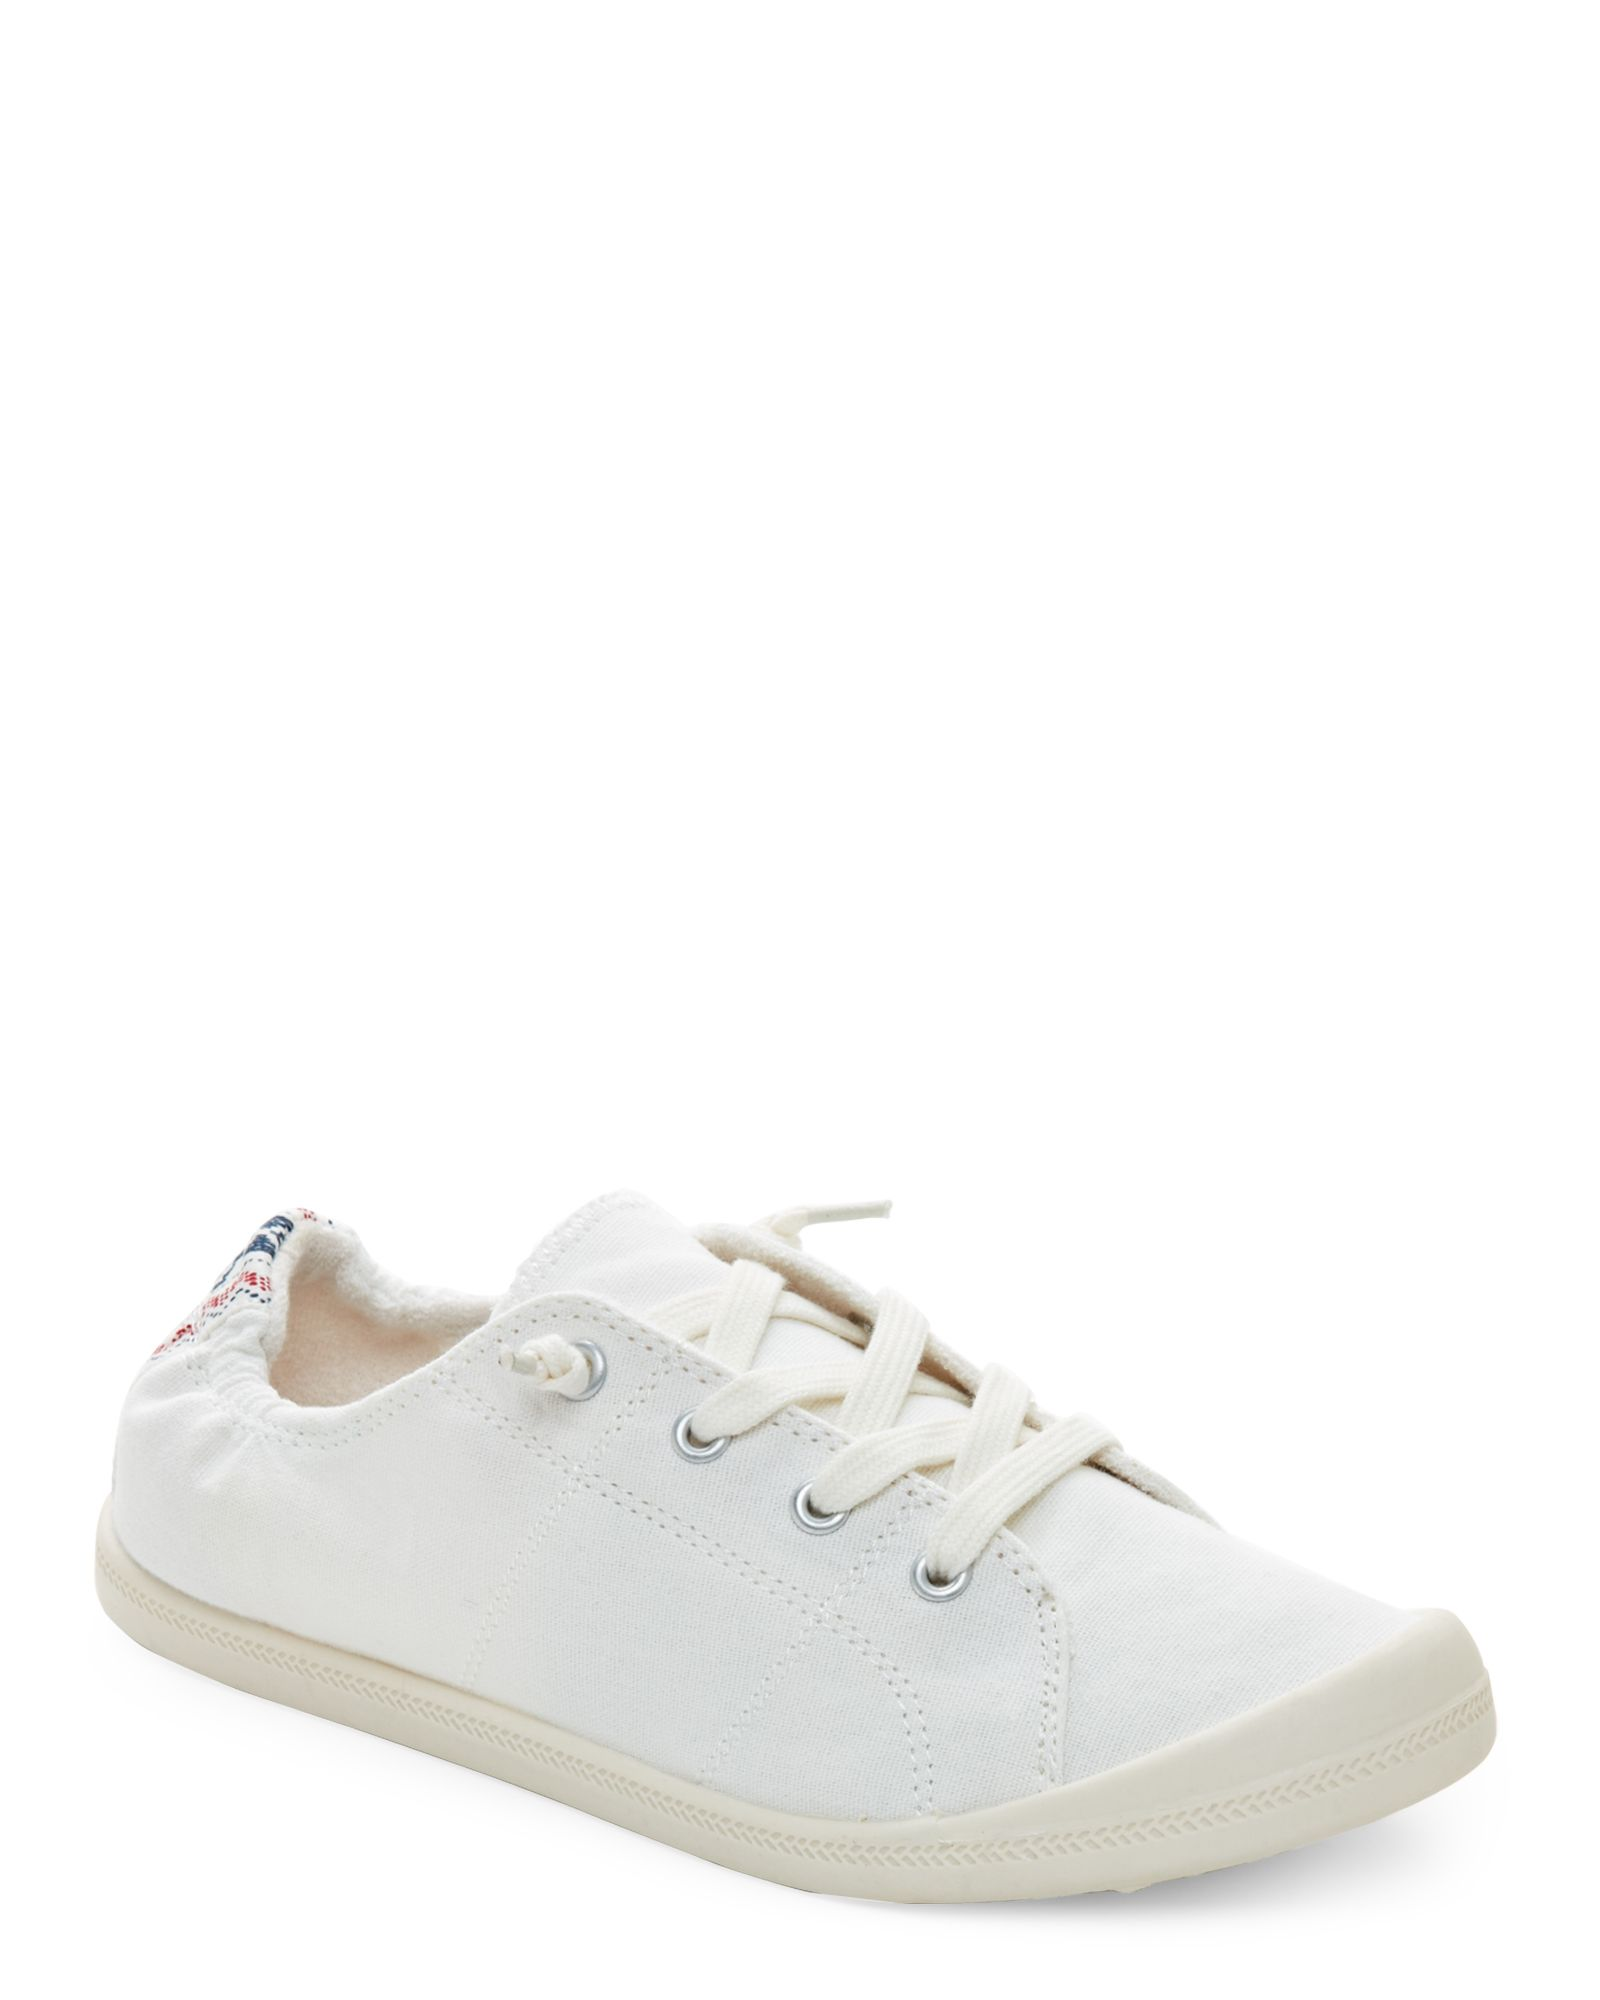 a624681777c Madden Girl White Bailey Slip On Sneakers